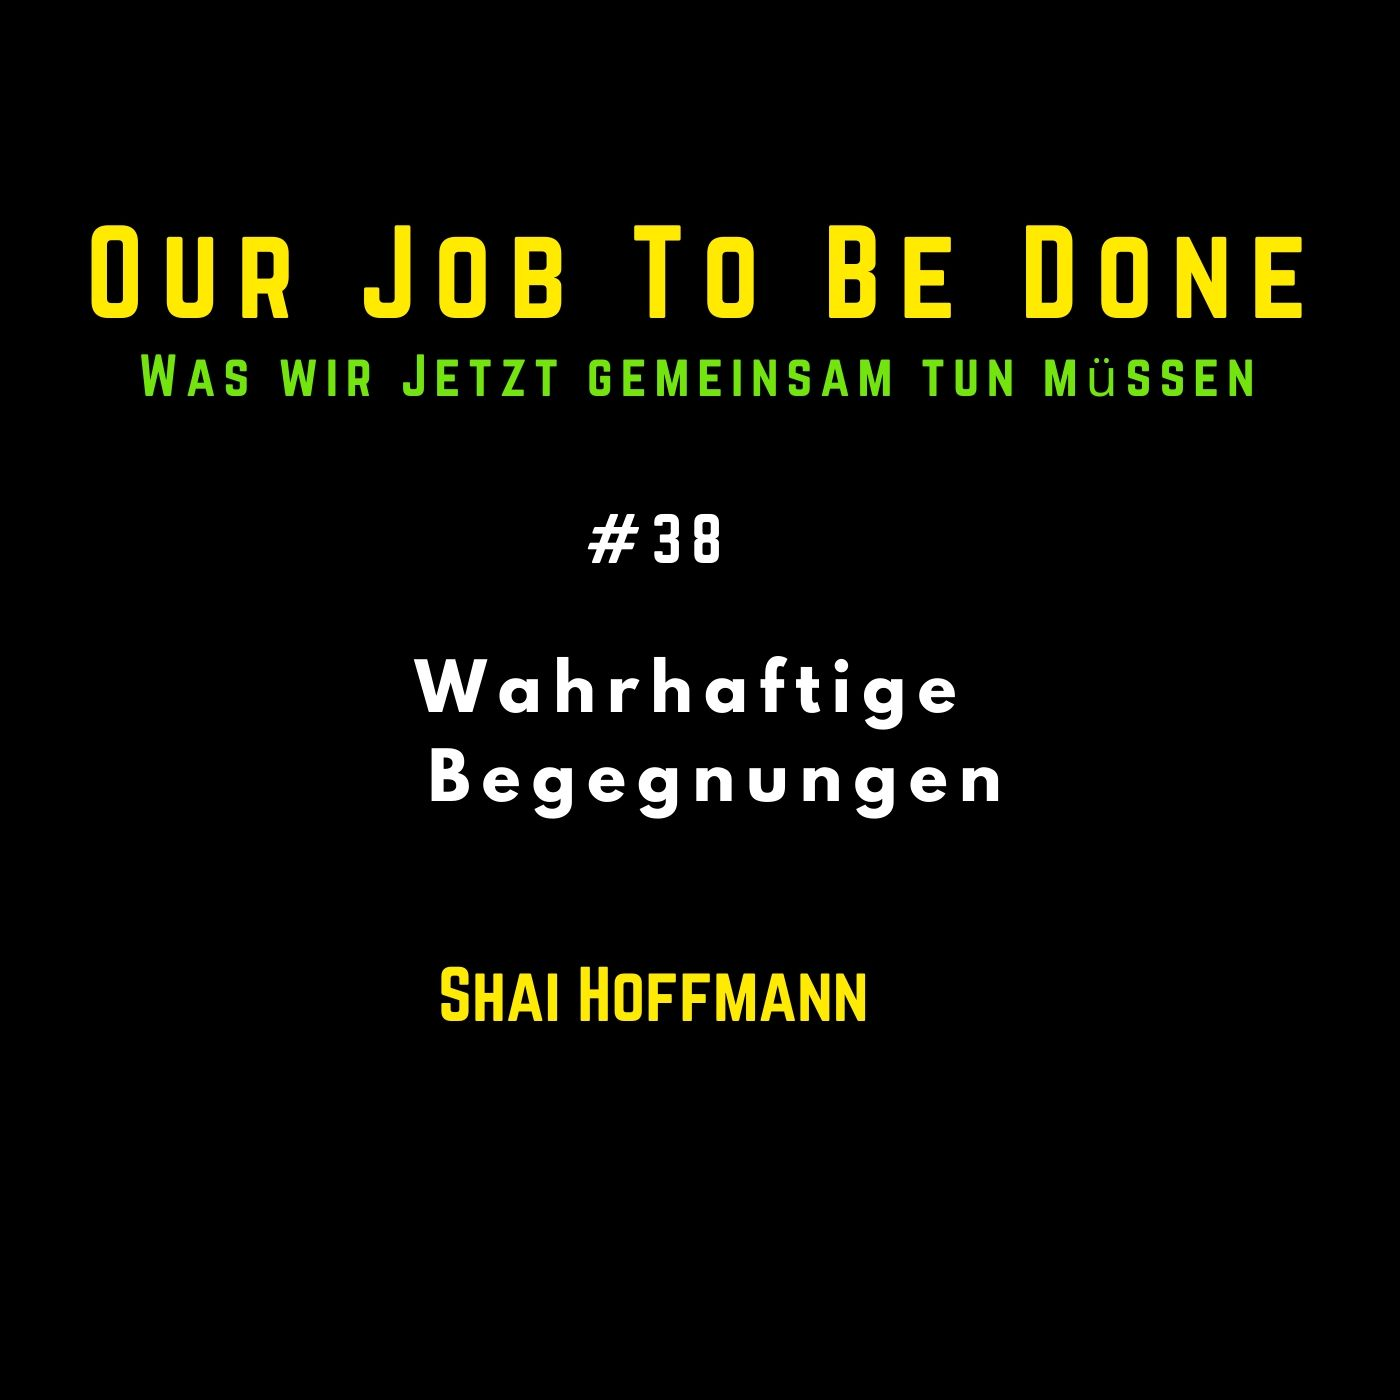 Thumbnail of https://podcast10f784.podigee.io/39-39-neue-episode